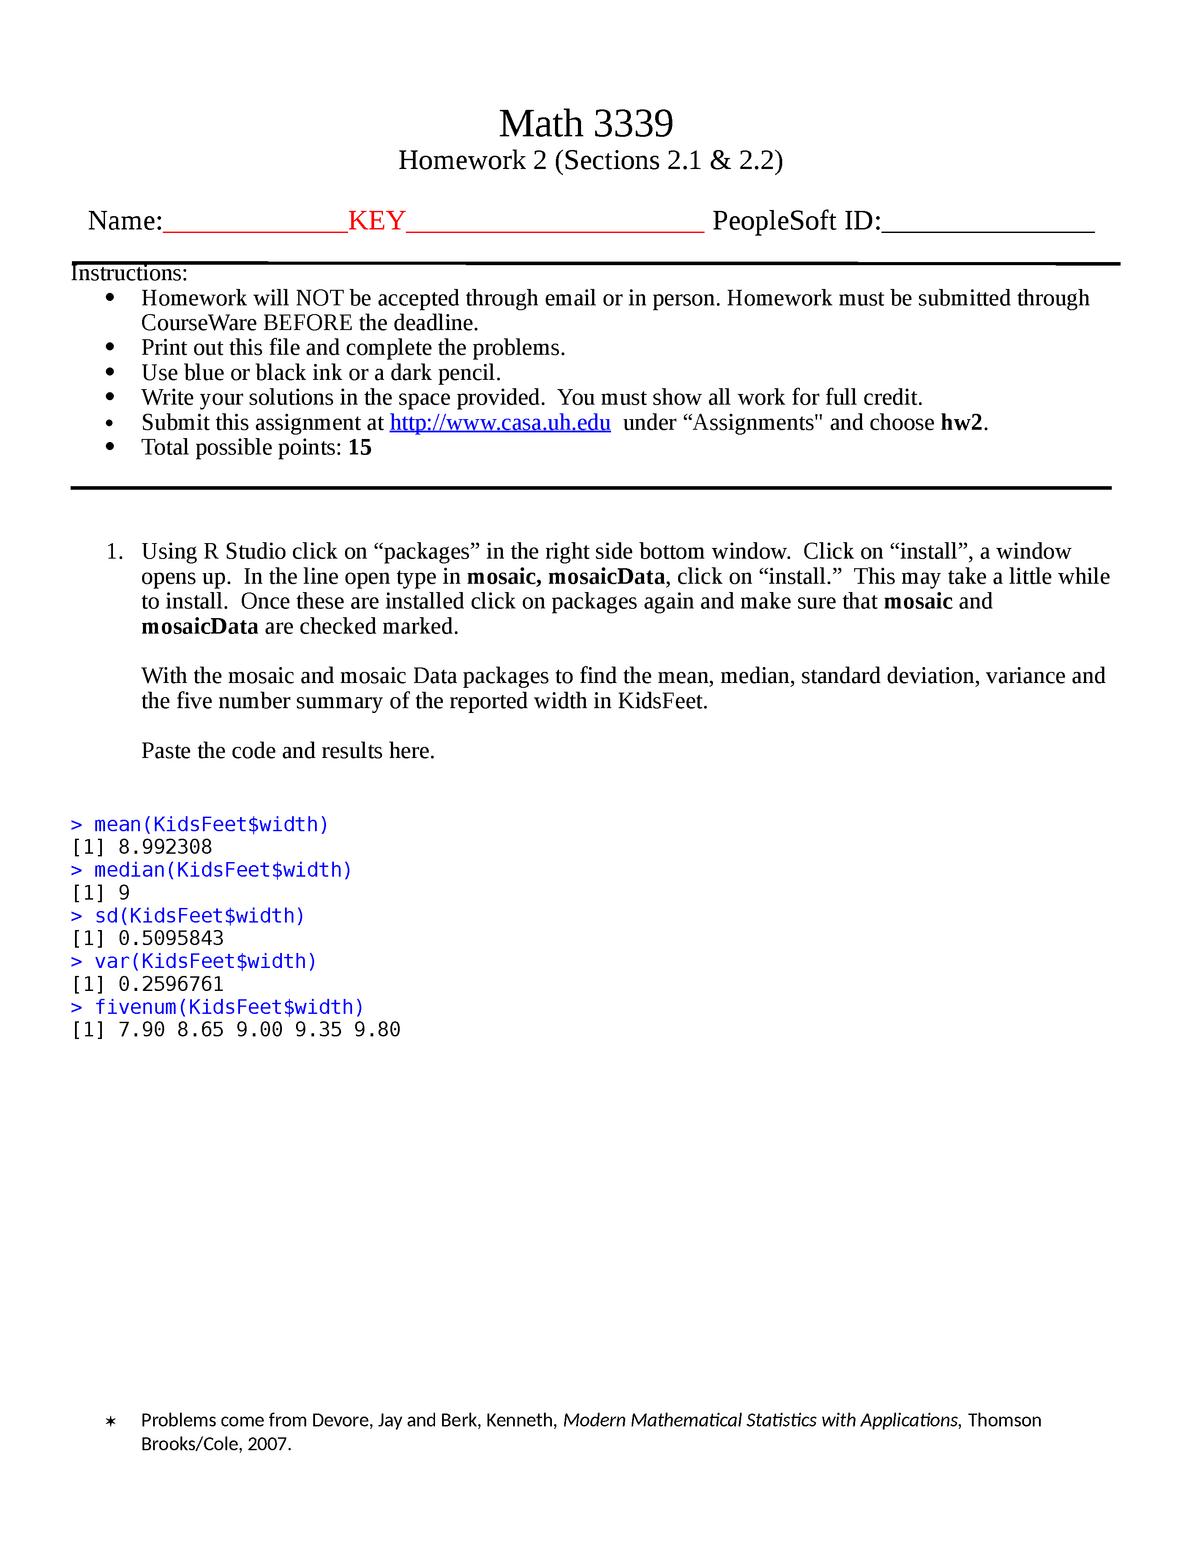 Hw2 key - MATH 3339 : Statistics for the Sciences - StuDocu